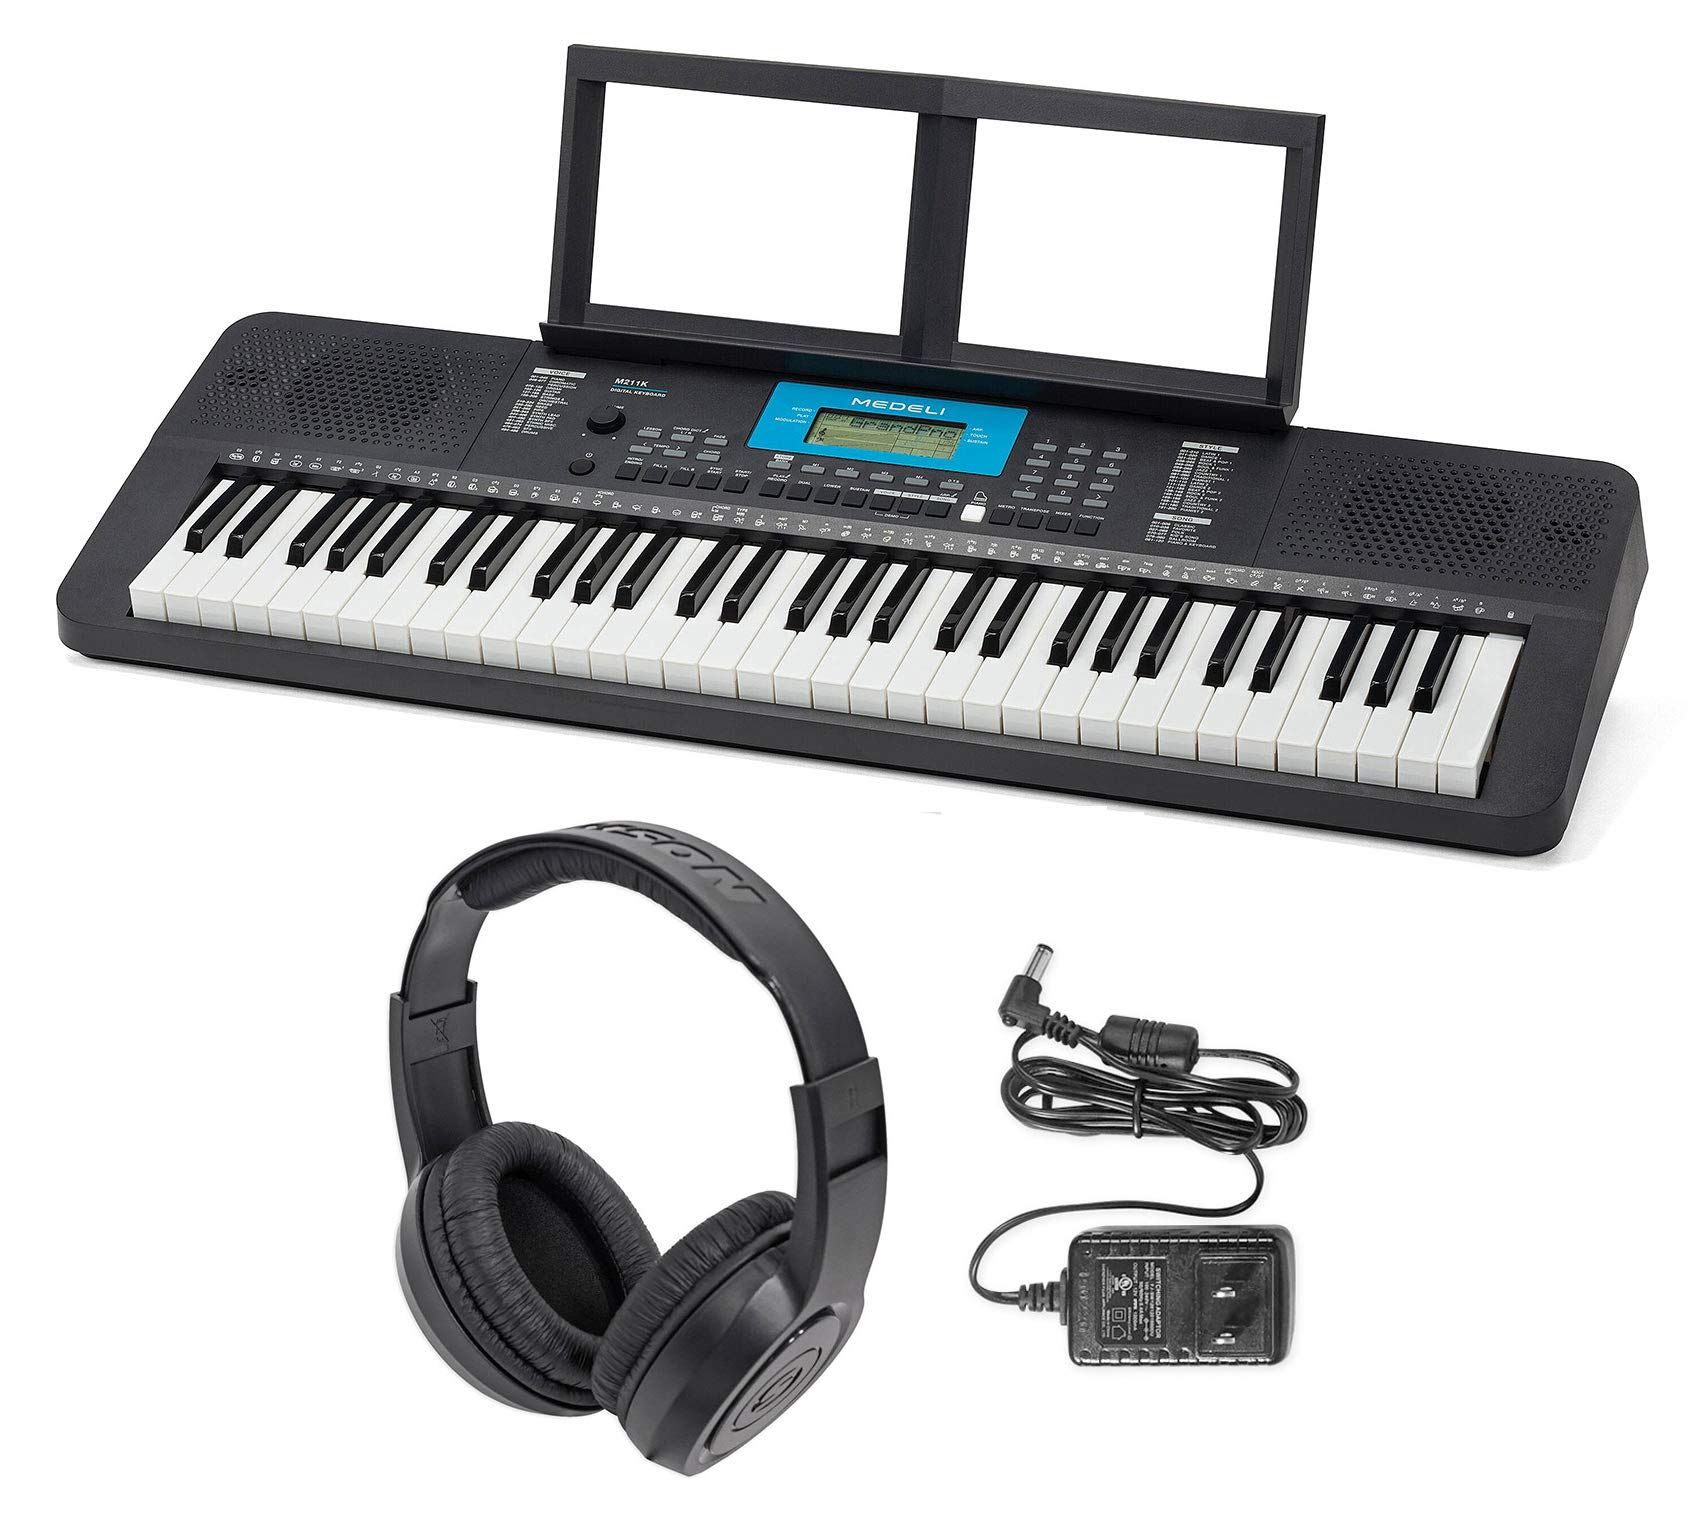 MEDELI M211K 61-Key USB MIDI Keyboard 32-Note Polyphony/Reverb+Heaphones+Adapter